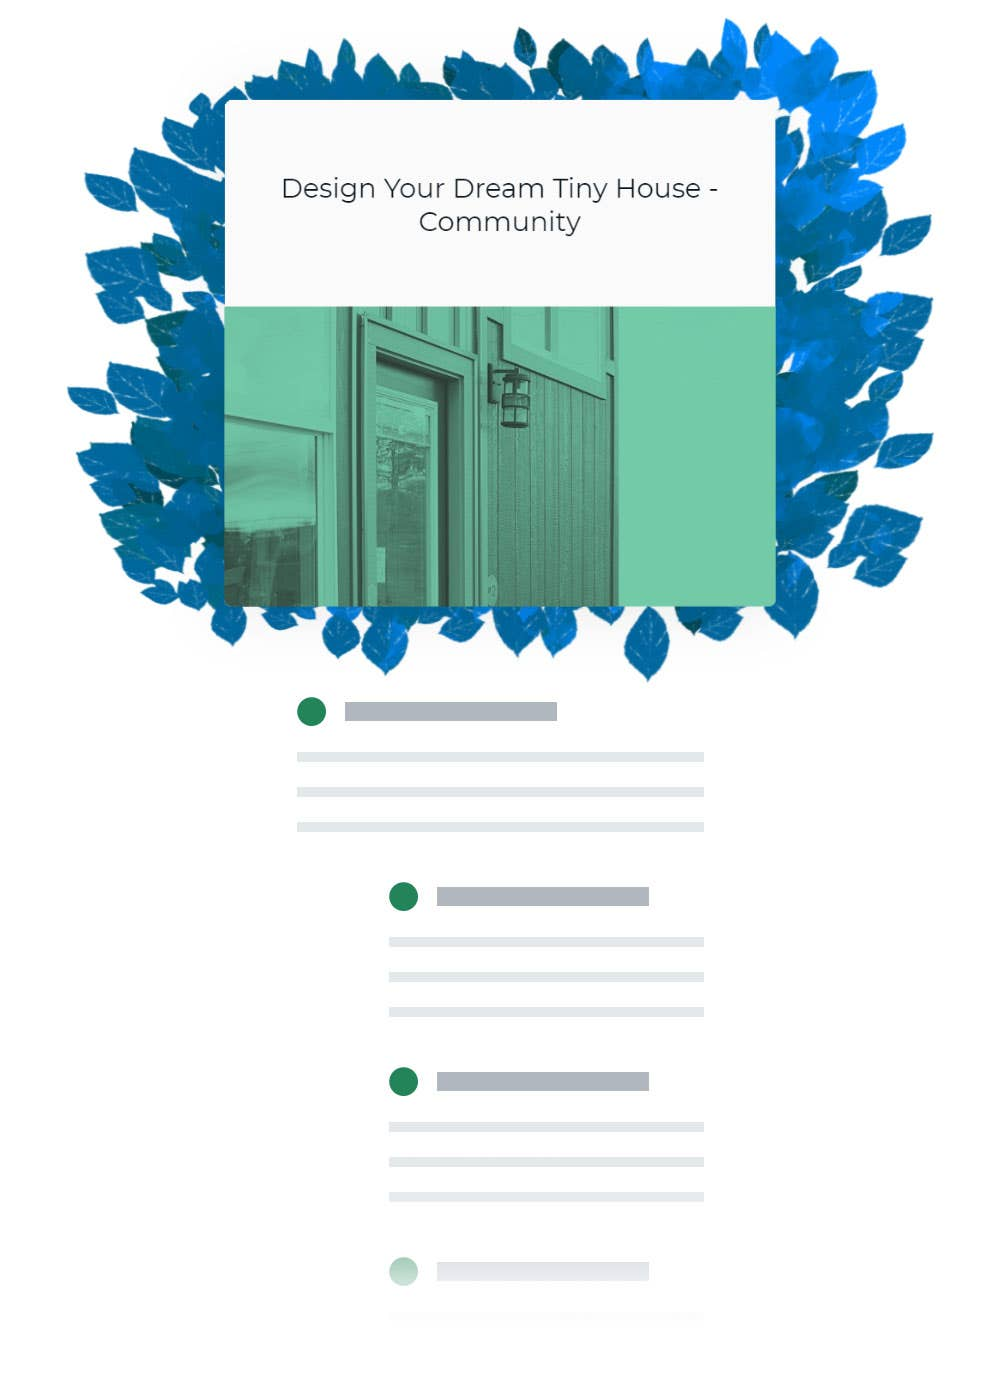 Tiny House DesignClass community